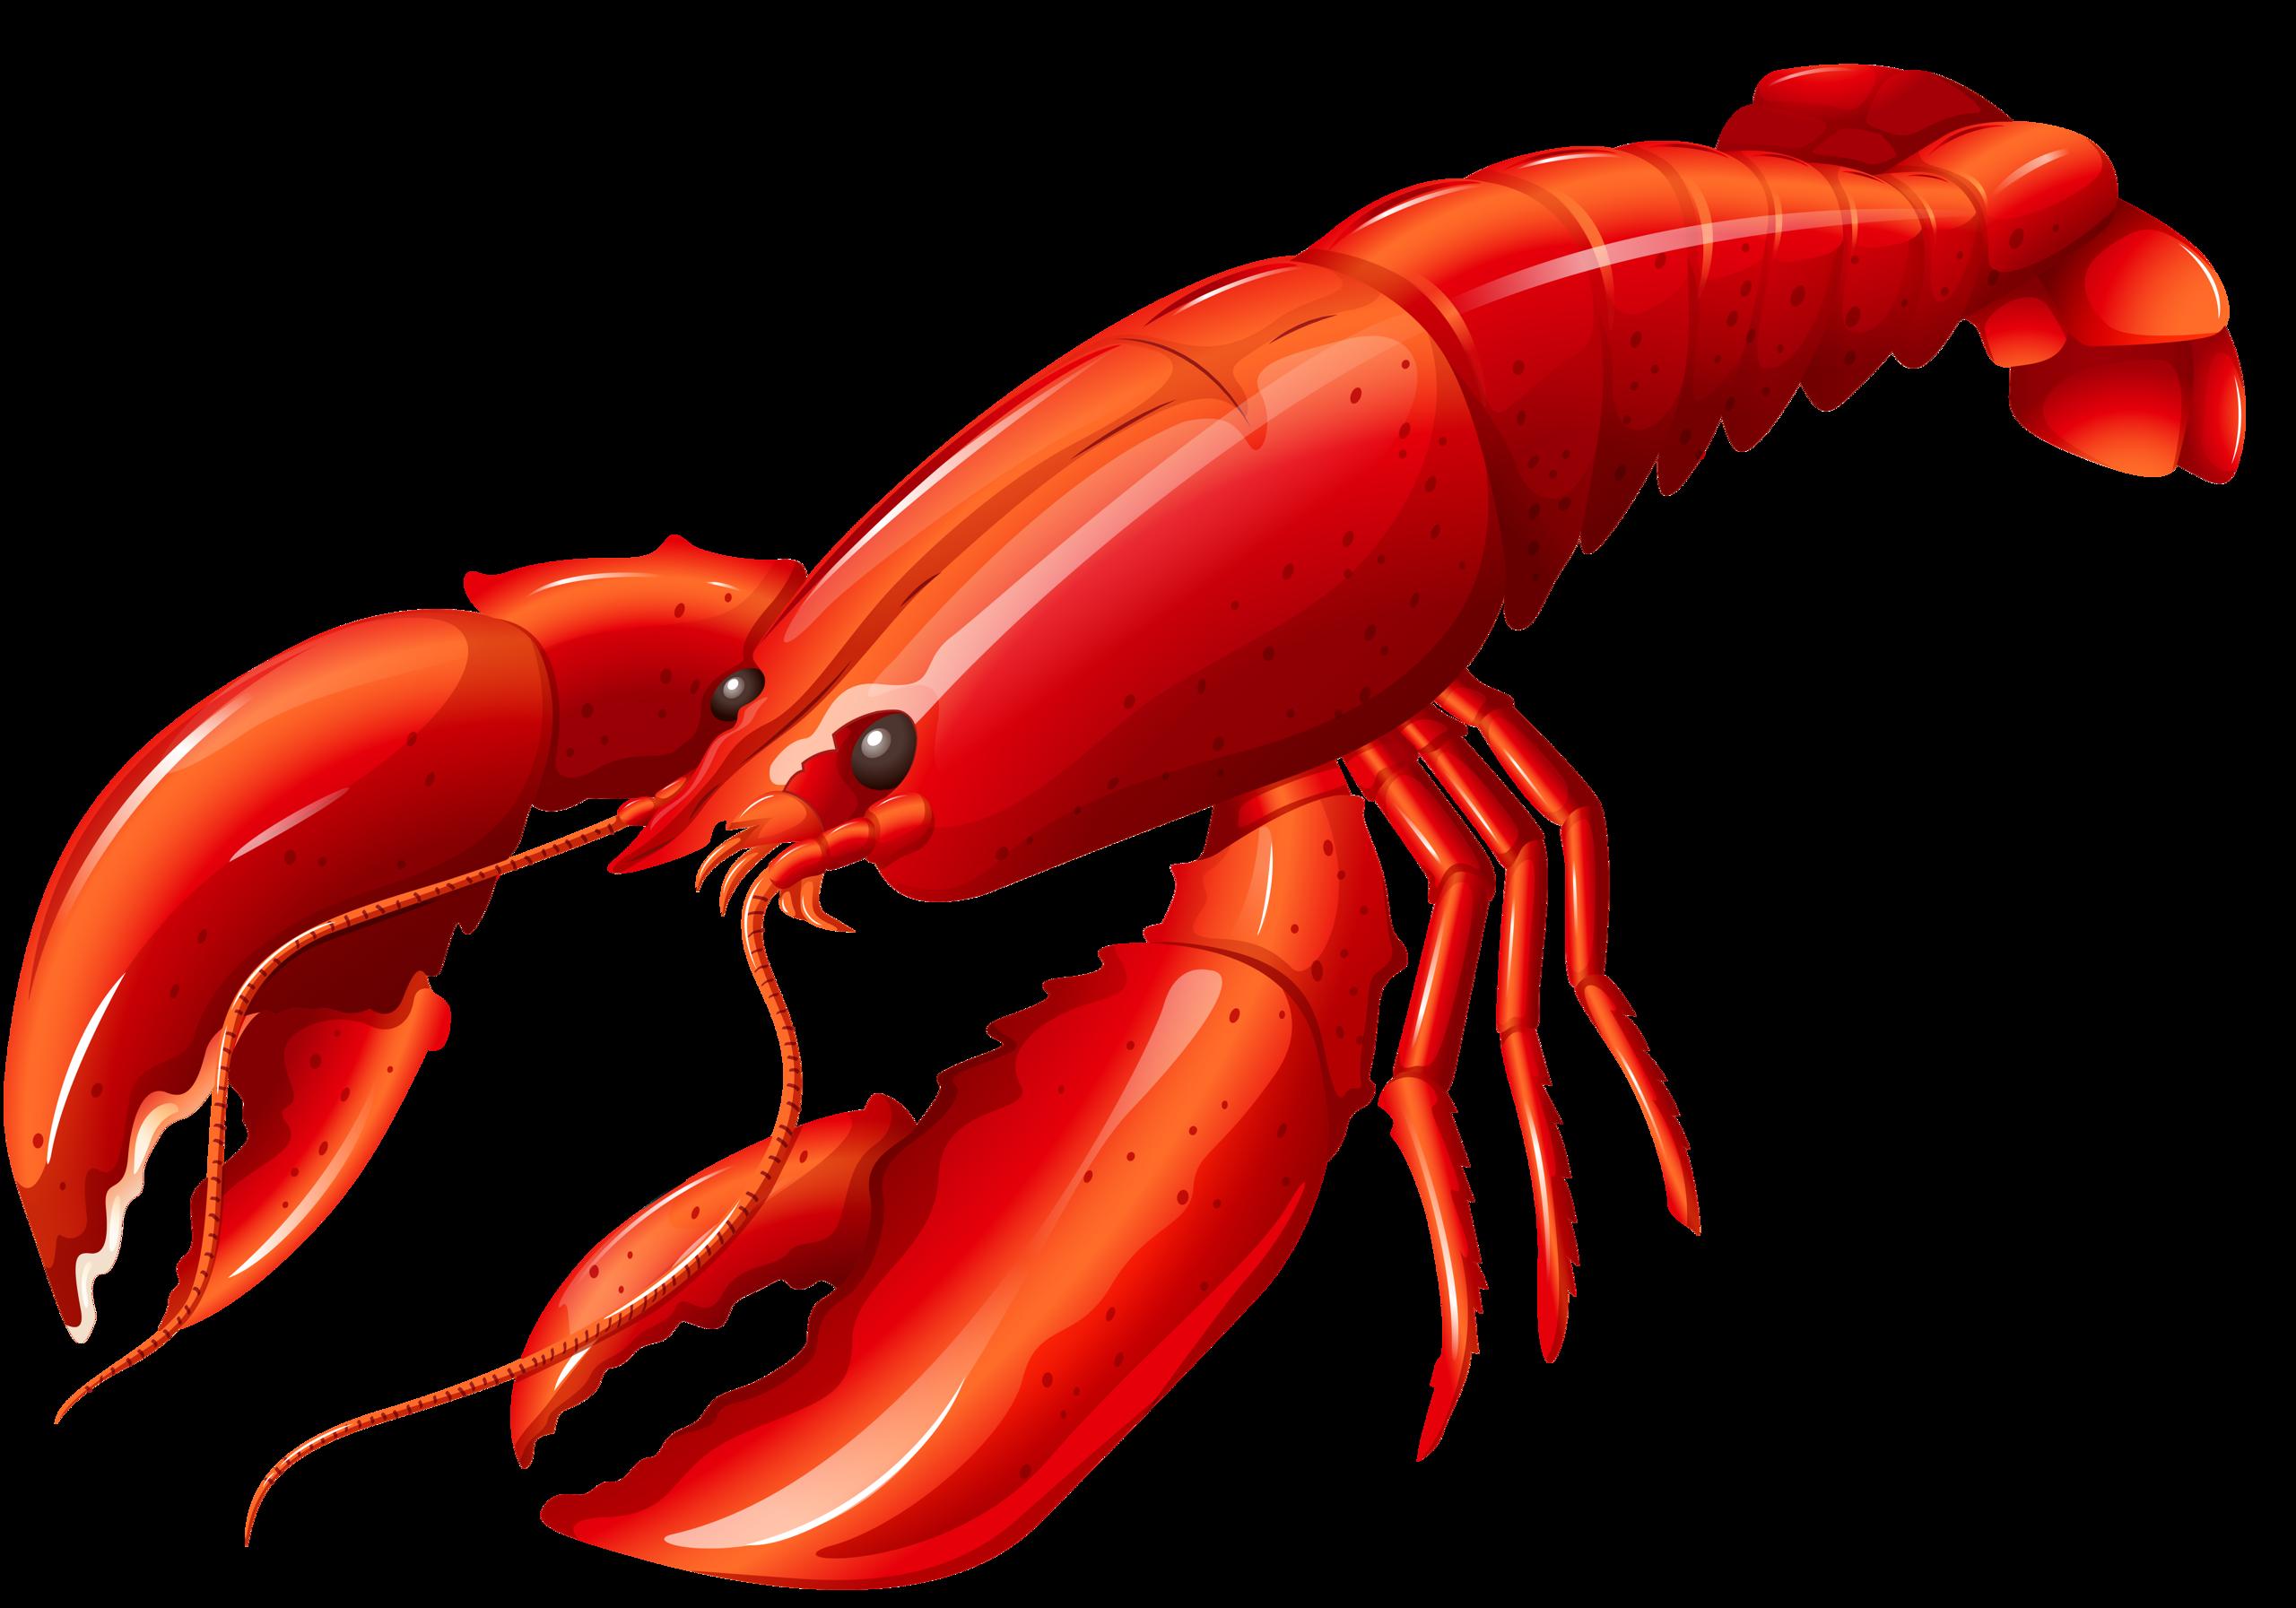 Crayfish Clipart at GetDrawings.com.